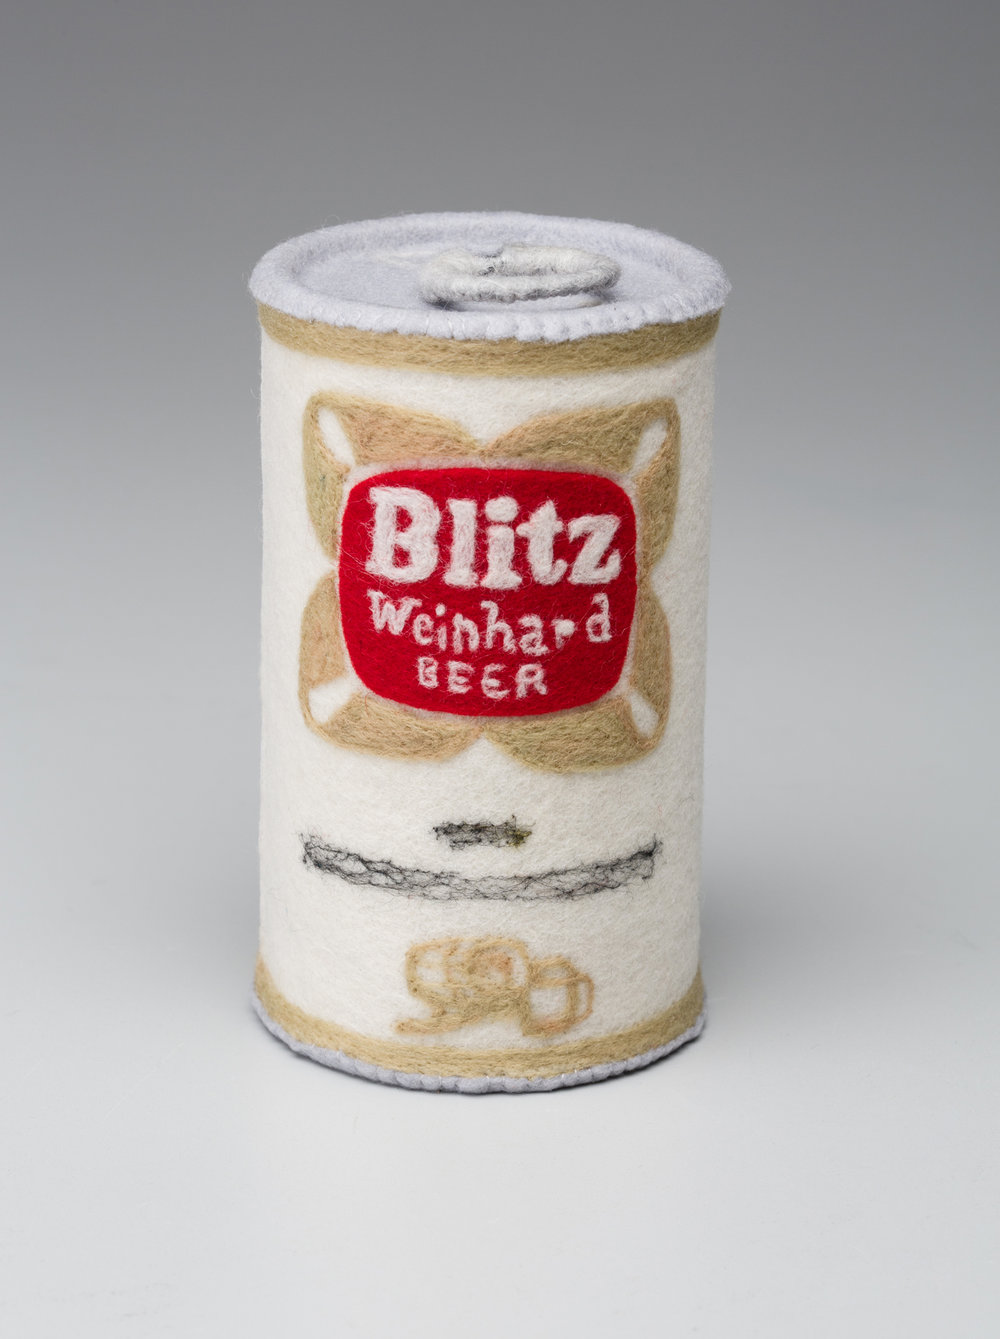 Blitz Can2 1920px long.jpg